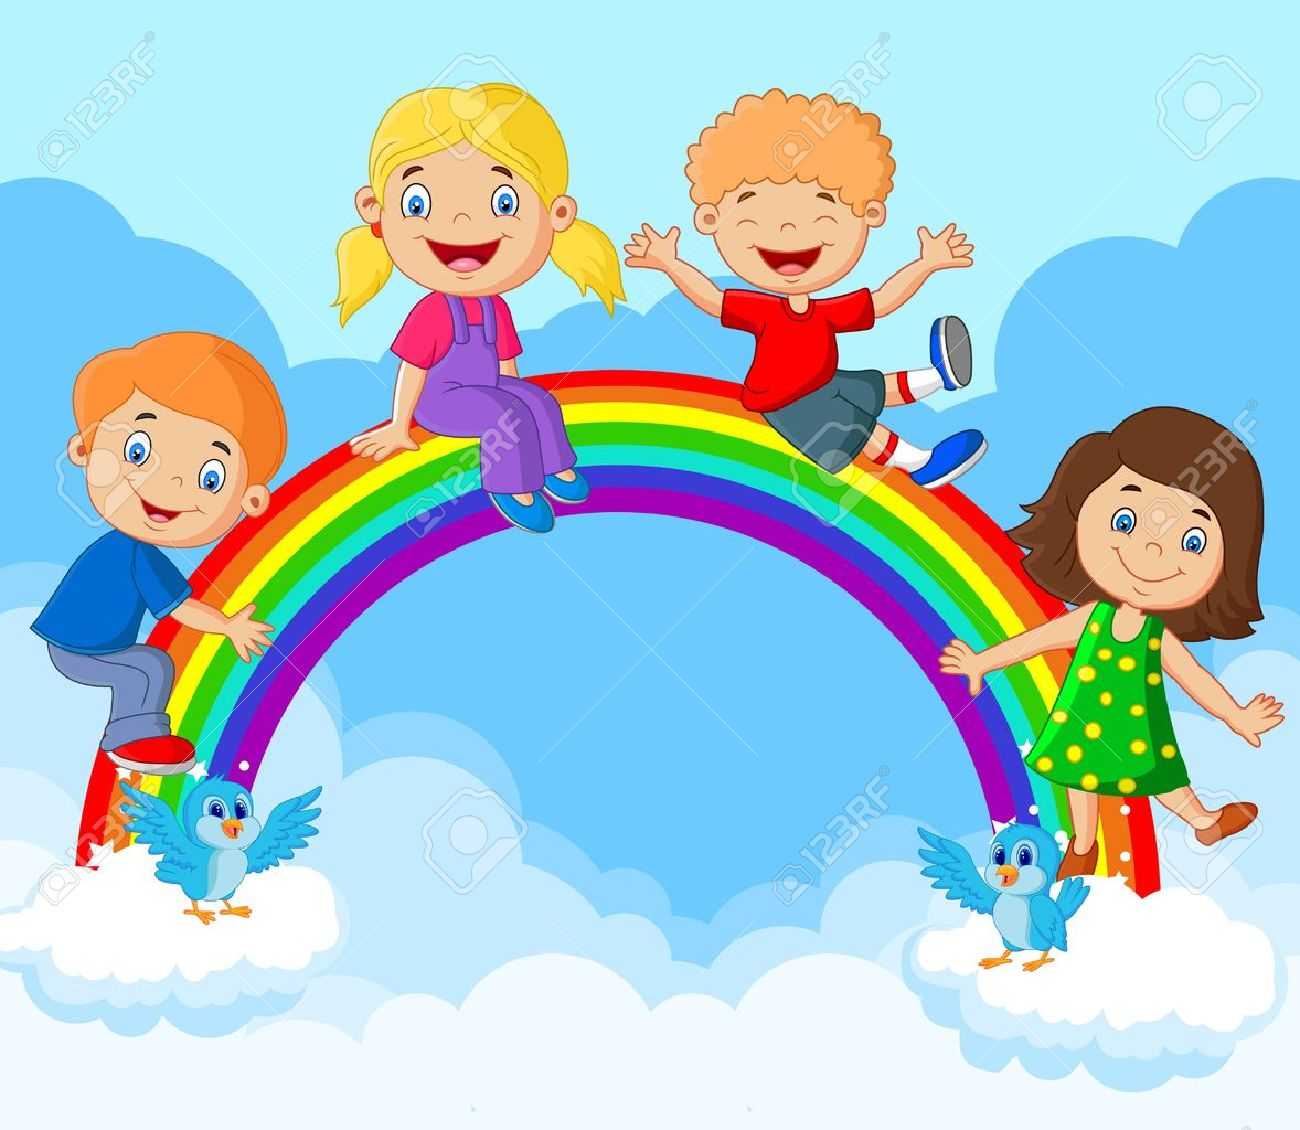 cartoon happy kids sitting on rainbow royalty free cliparts